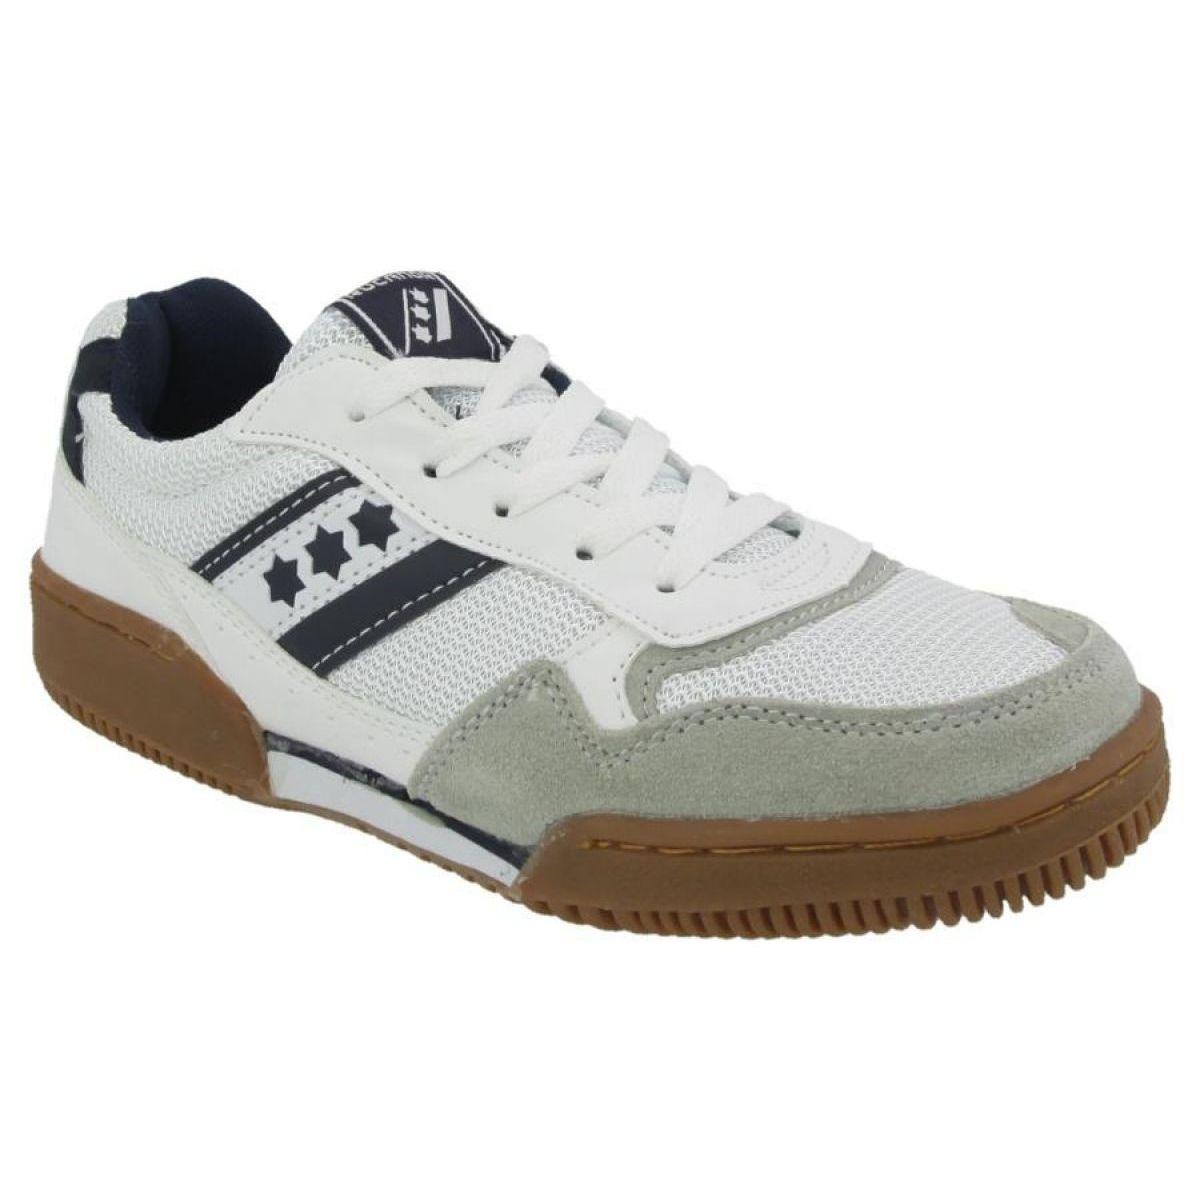 Buty Halowe Rucanor Balance Biale Biale Indoor Shoe Shoes Shoe Reviews